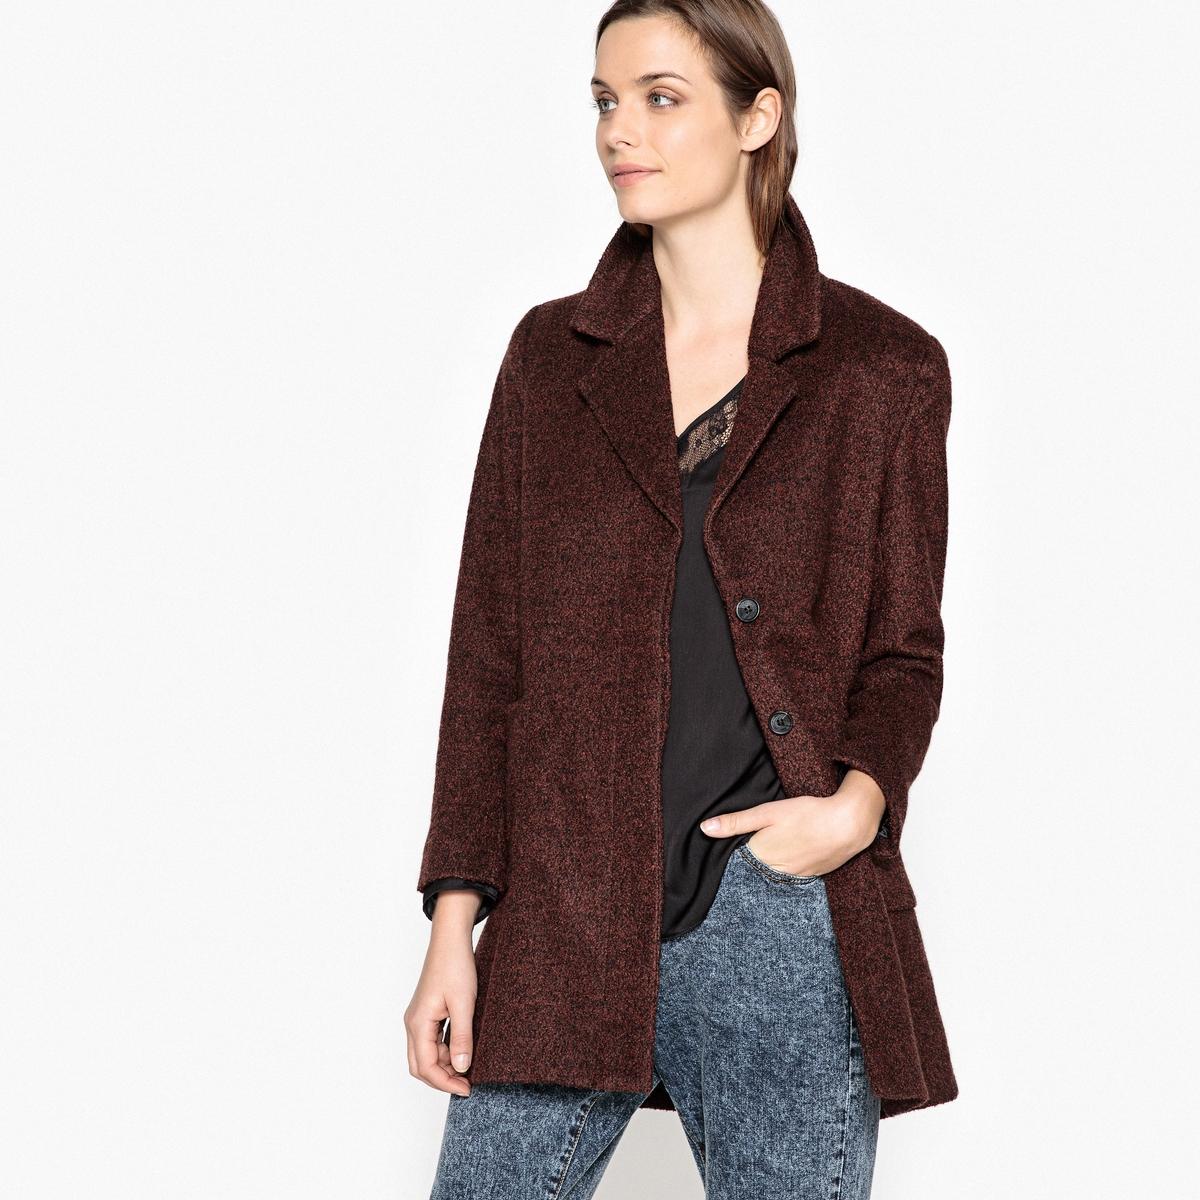 Пальто пальто драповое 30% шерсти